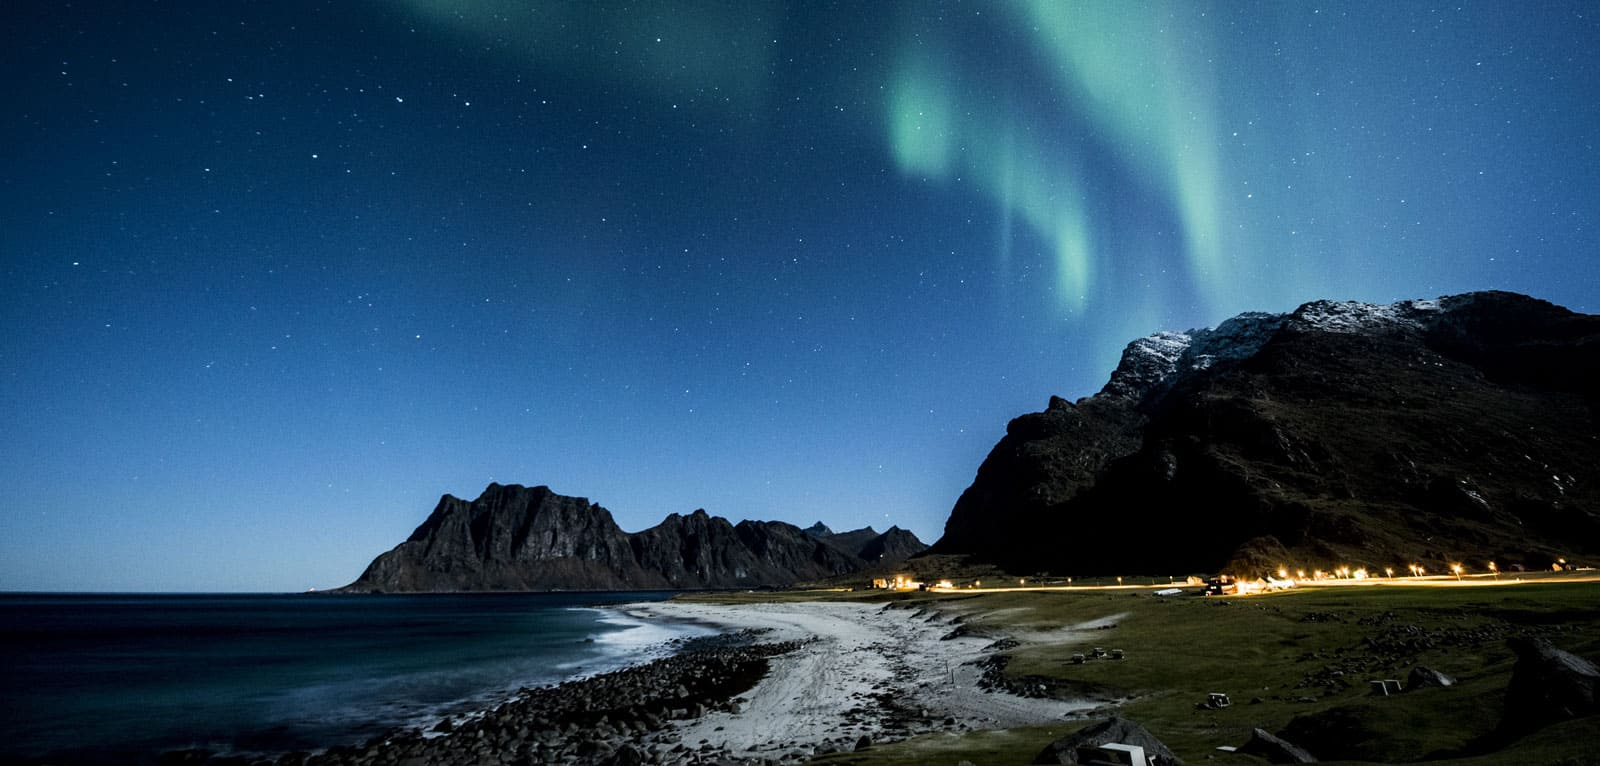 tour isole lofoten e capo nord aurora boreale